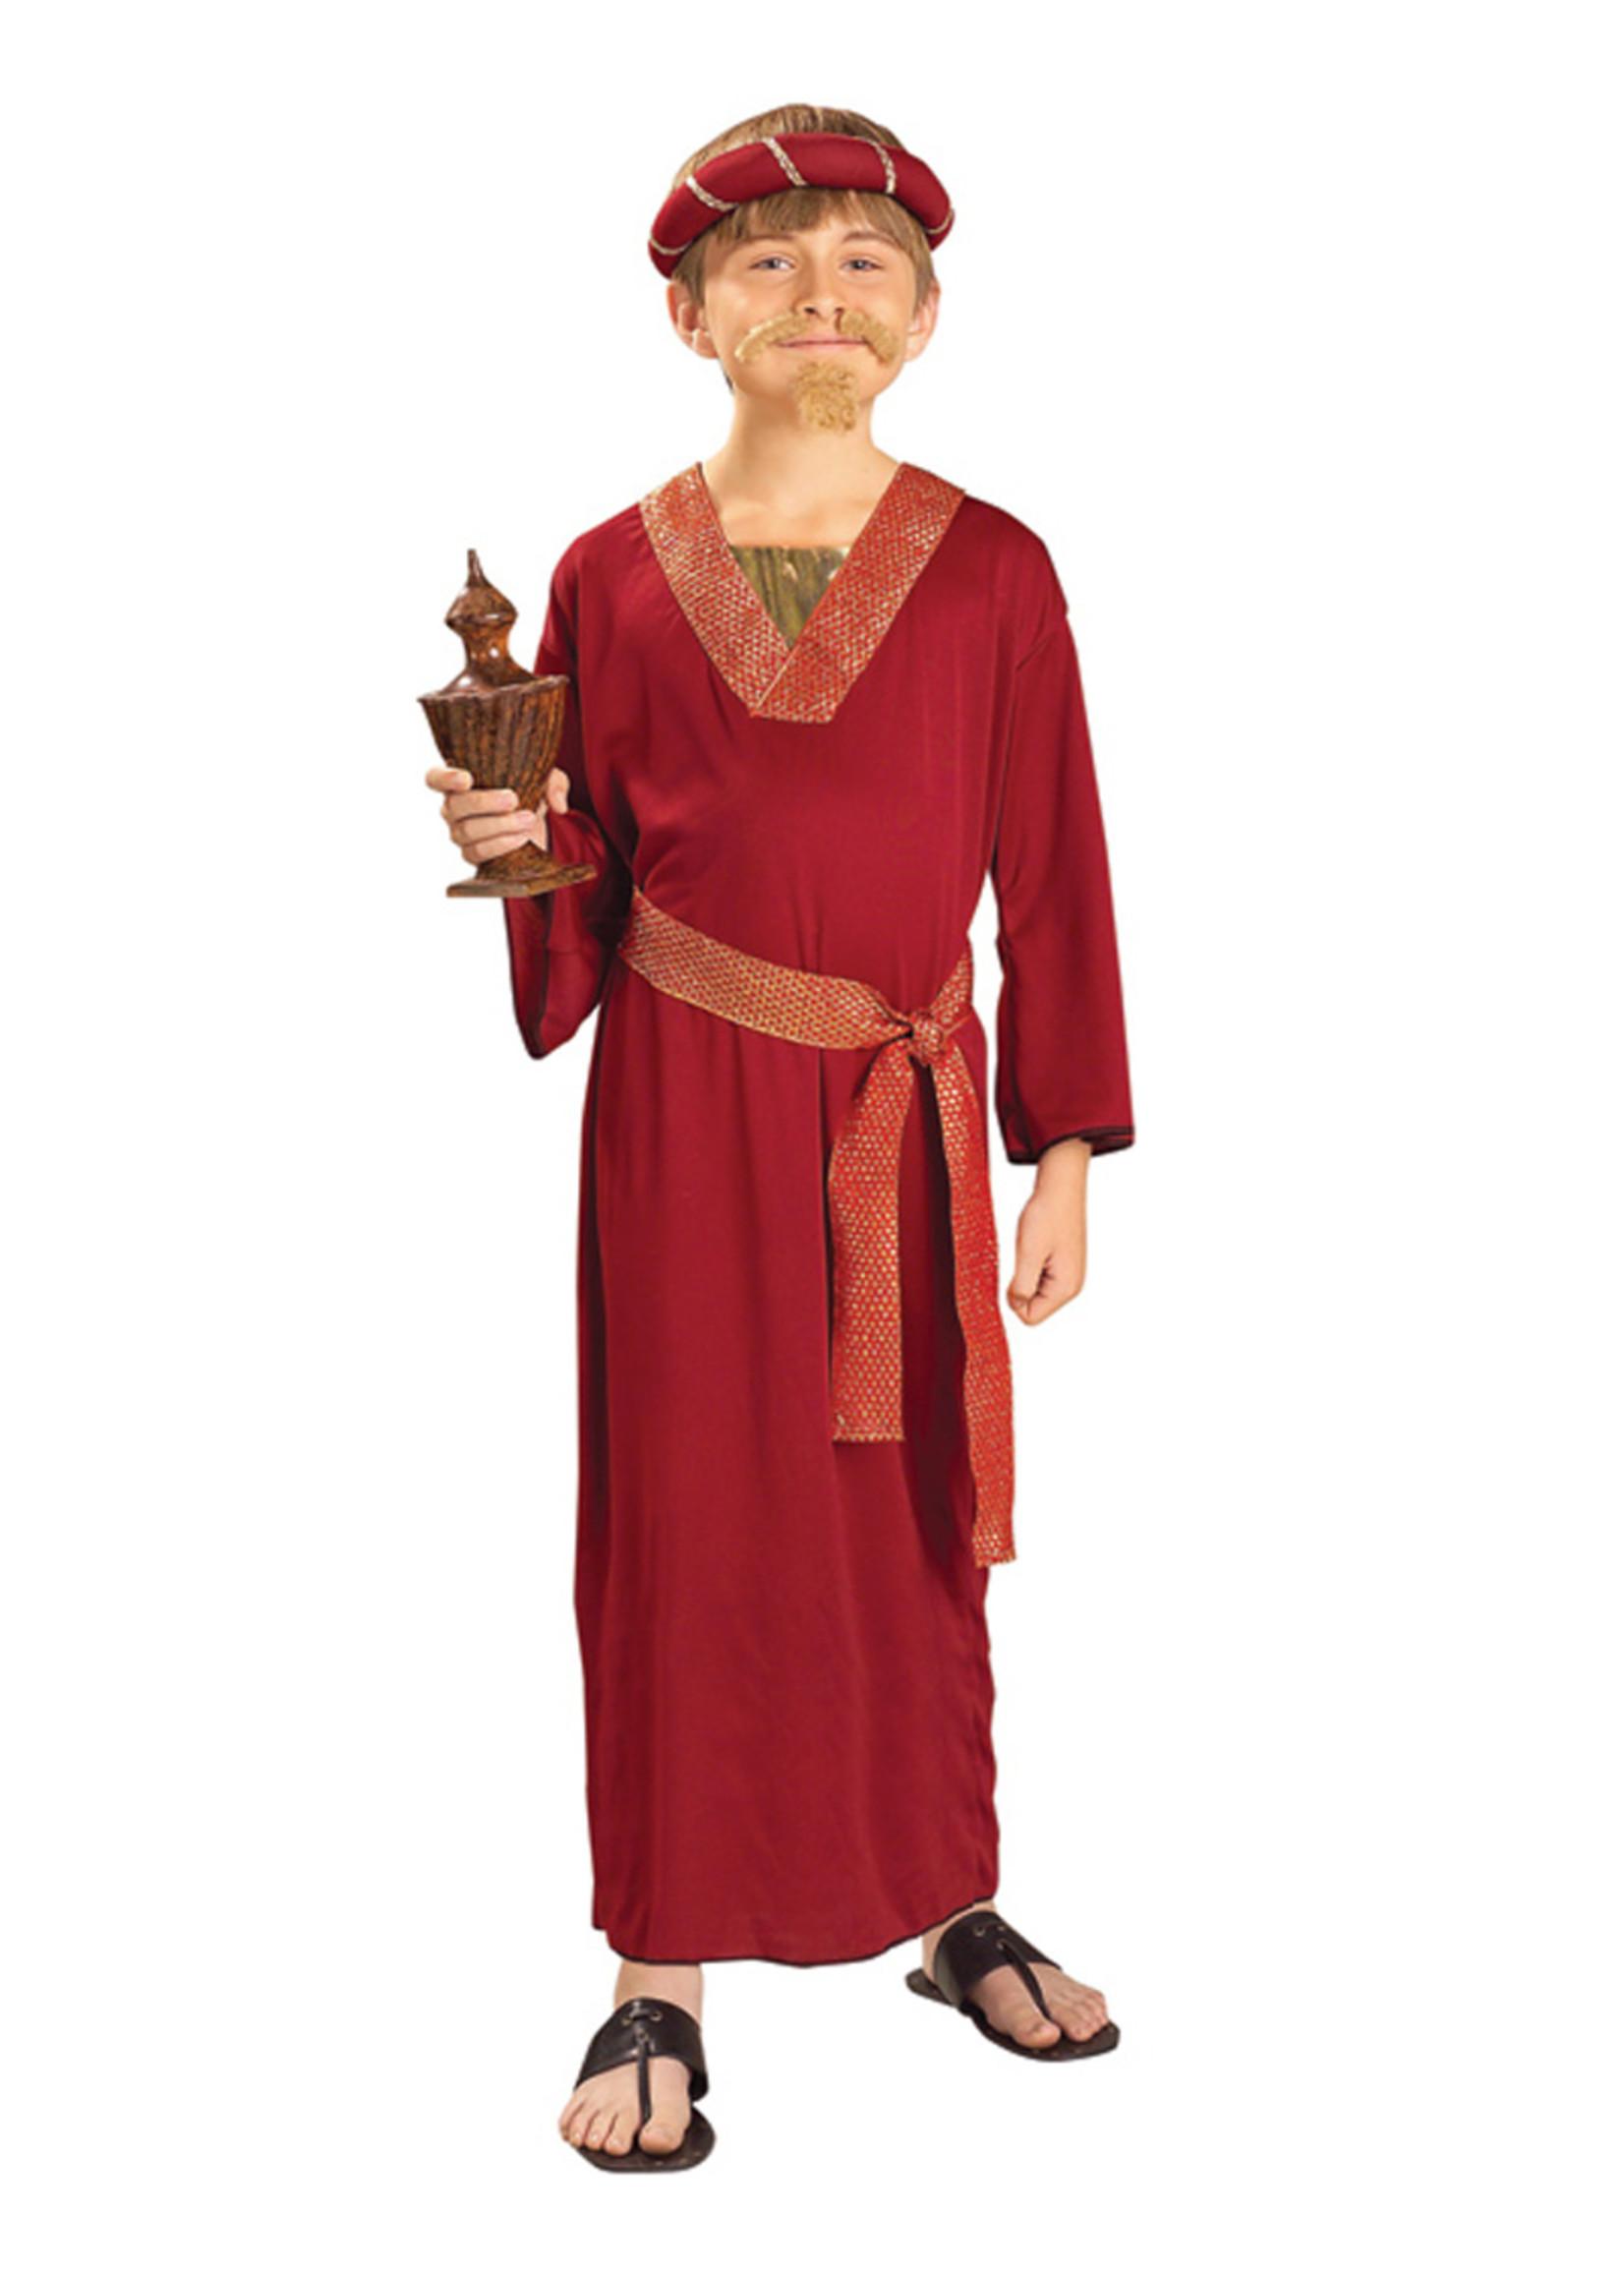 FORUM NOVELTIES Wise Man - Burgundy Costume - Boy's